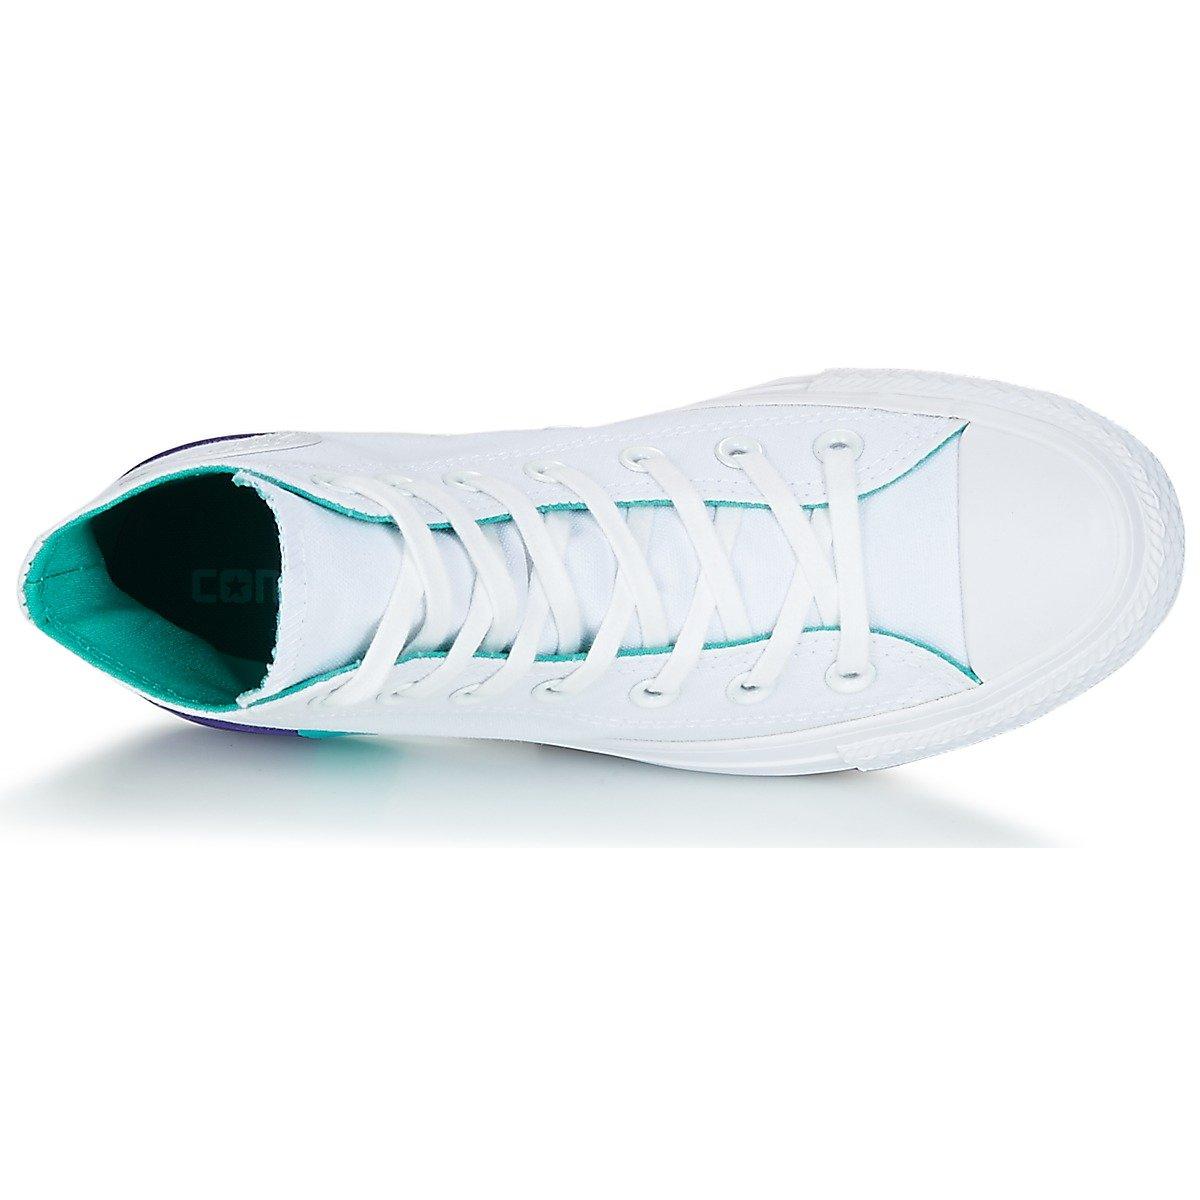 Converse Unisex-Erwachsene Chuck Taylor CTAS Hi Canvas Fitnessschuhe, beige Weiß (White/Enamel Aqua/Court Purple 115)